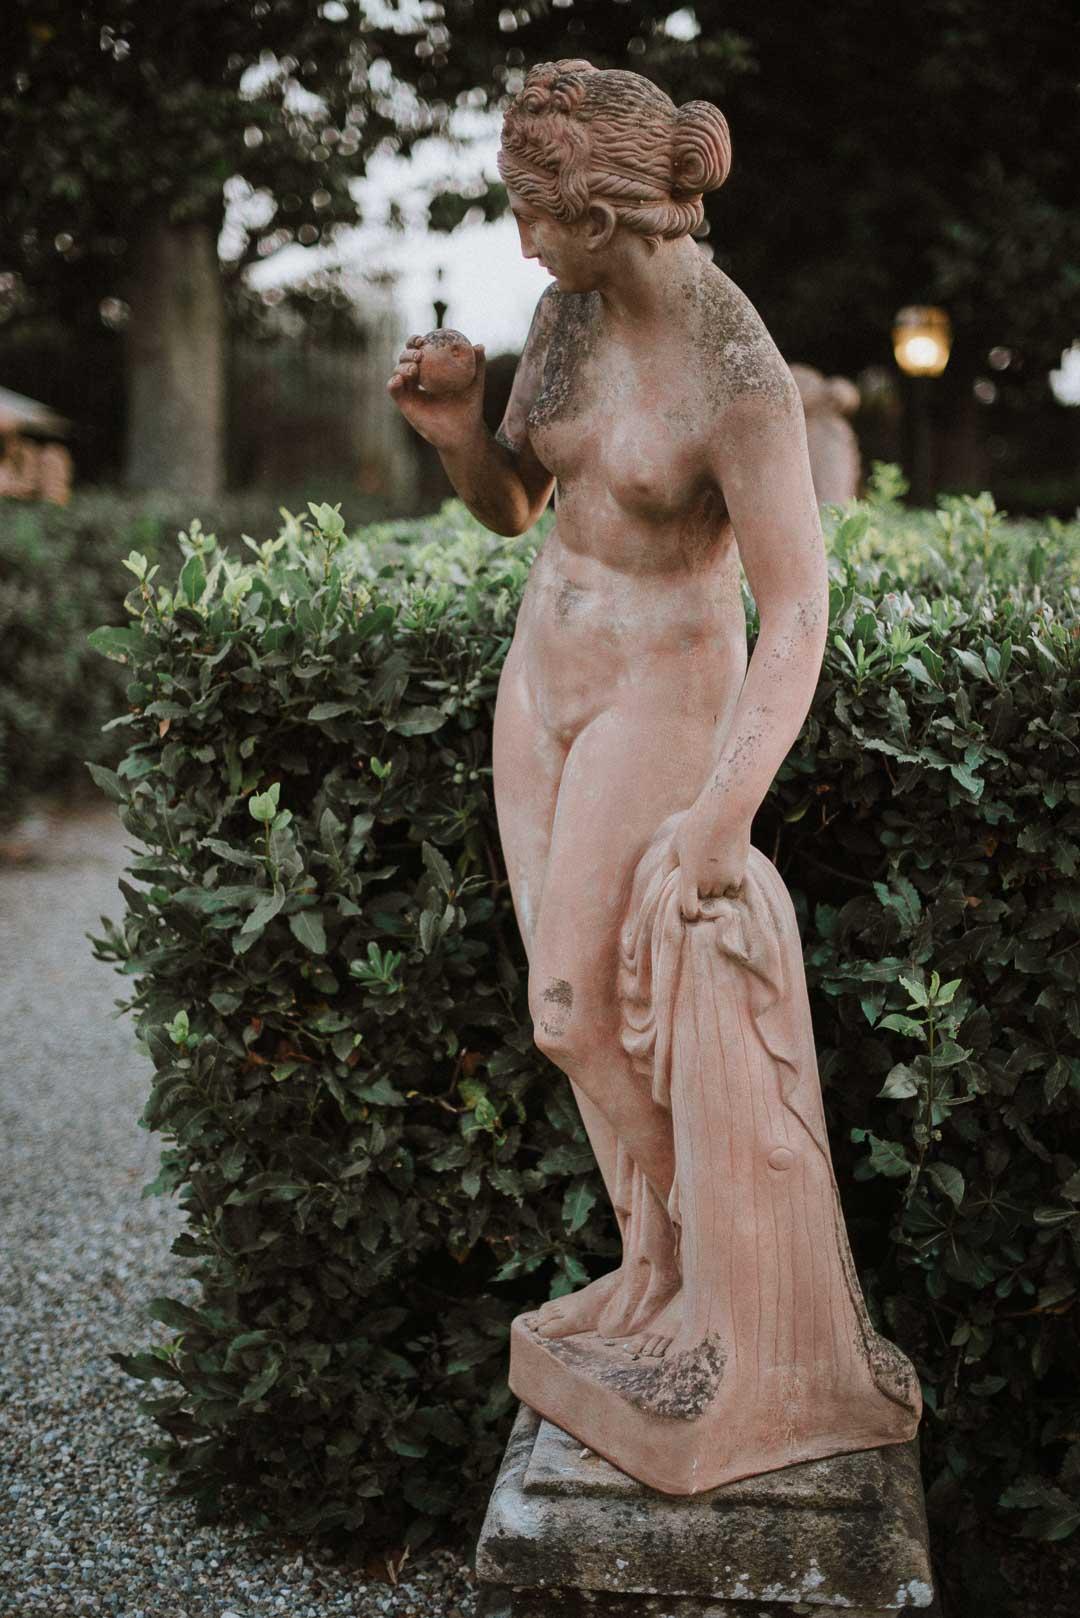 wedding-photographer-destination-fineart-bespoke-reportage-tuscany-villascorzi-vivianeizzo-spazio46-153